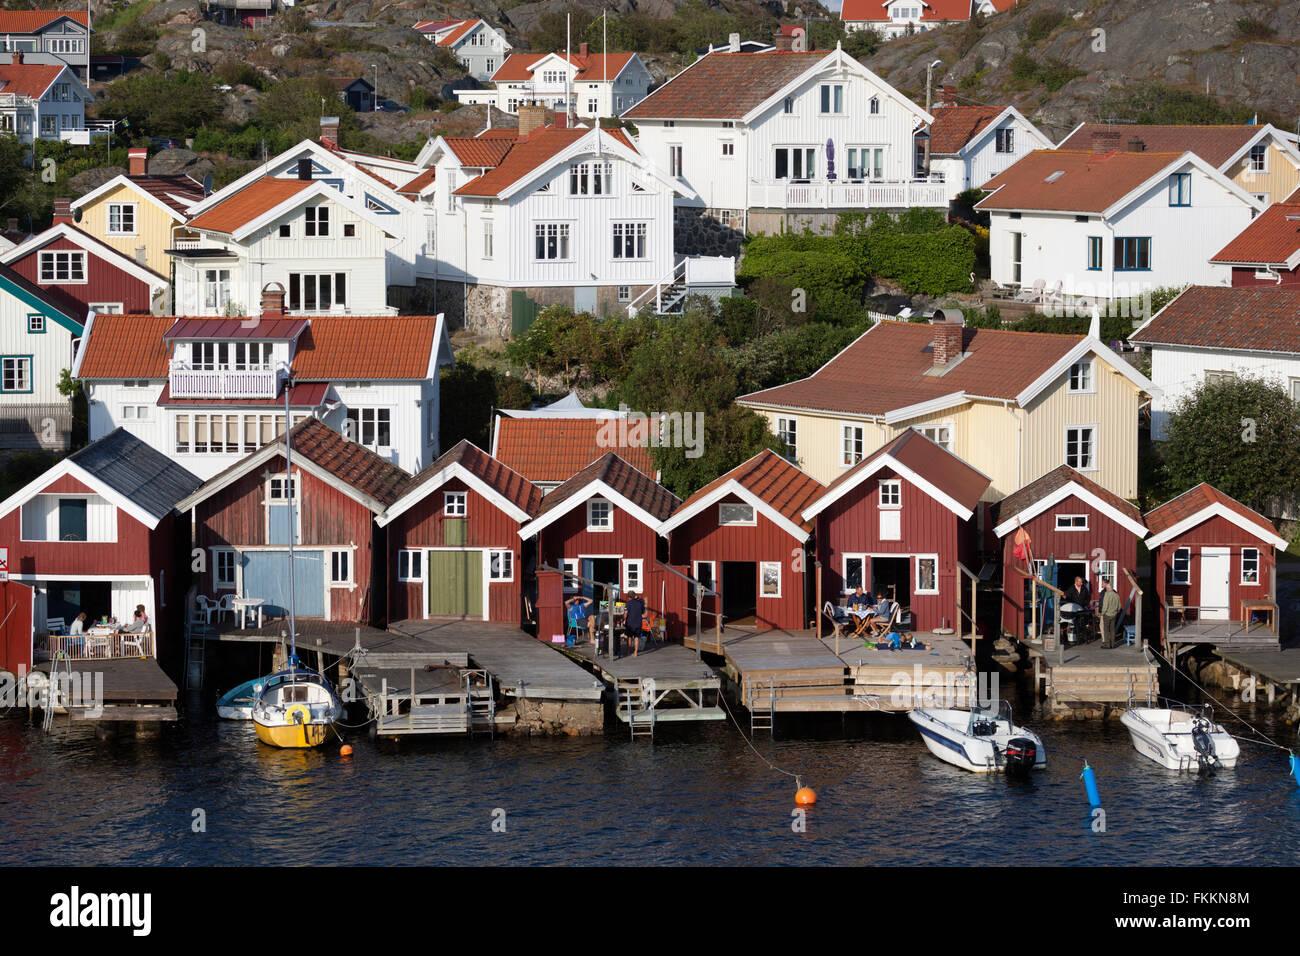 Traditional falu red fishermen's houses, Hälleviksstrand, Orust, Bohuslän Coast, Southwest Sweden, - Stock Image